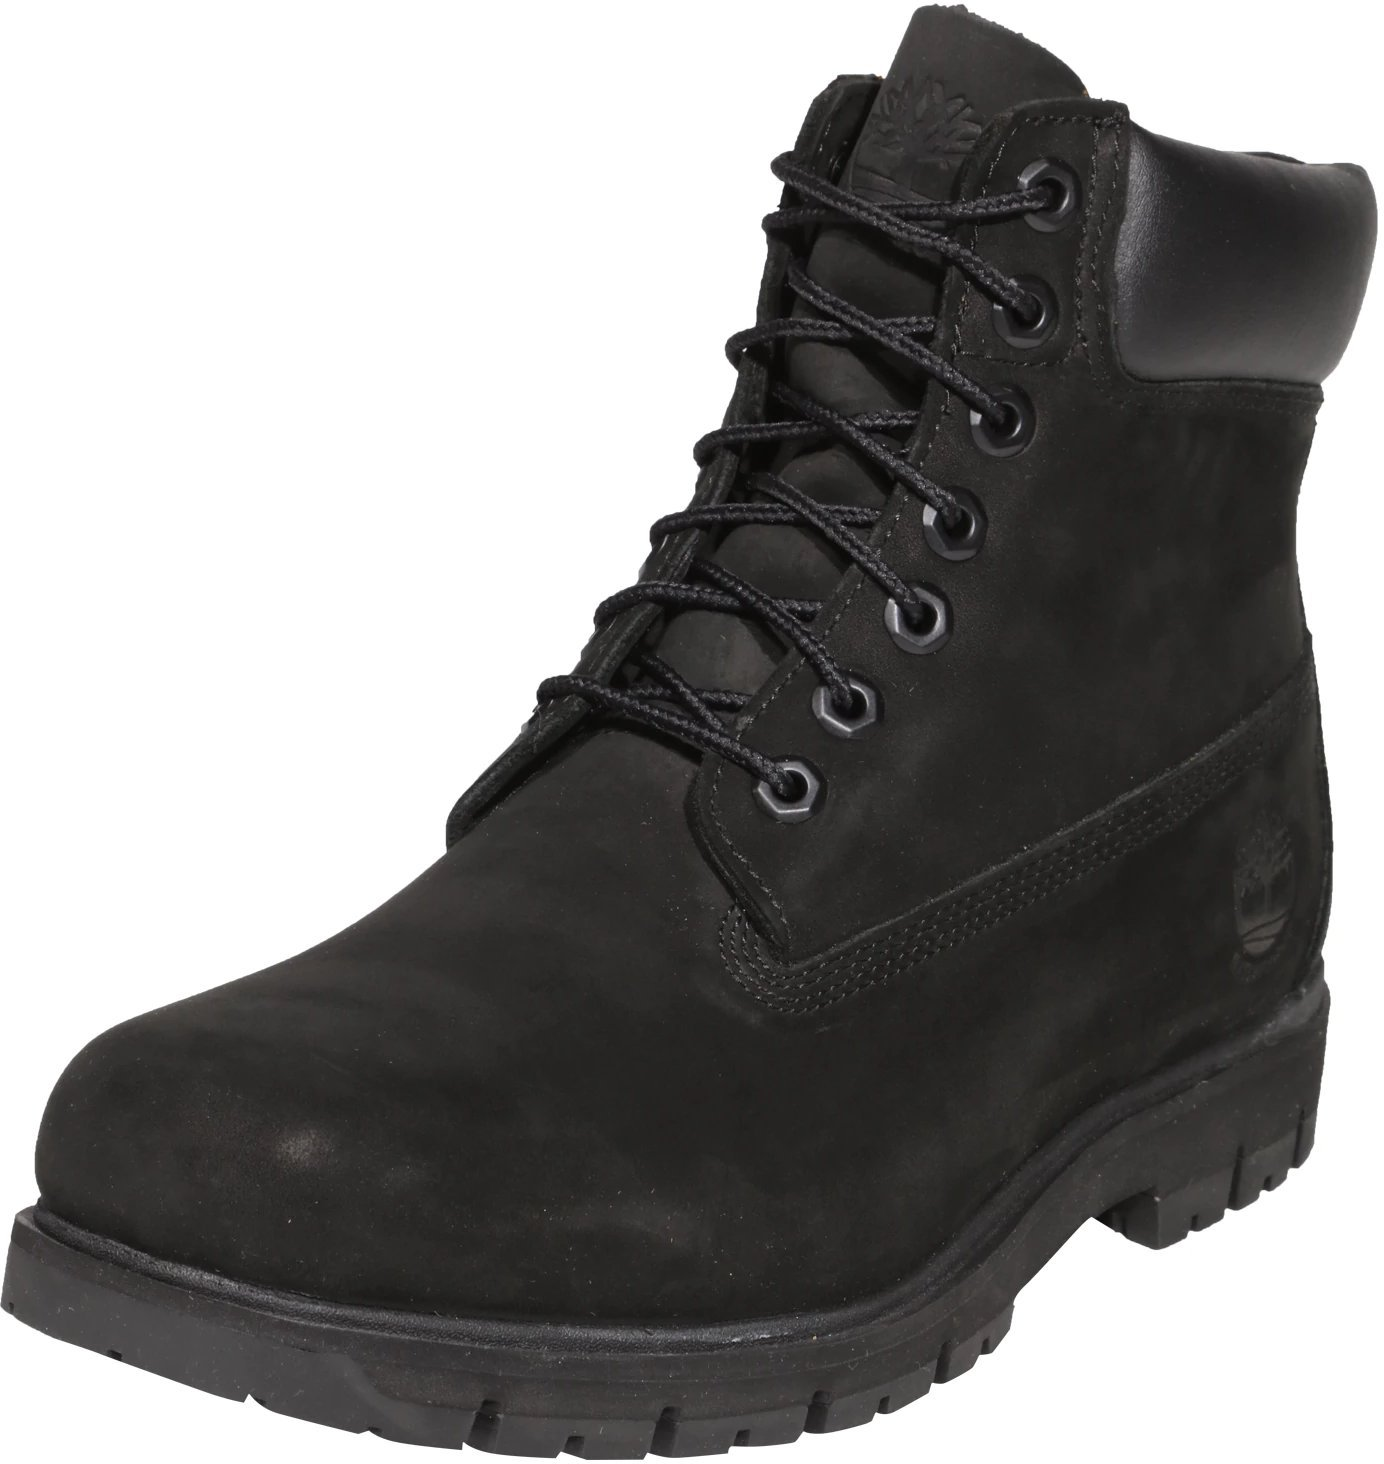 Timberland Radford 6 Inch Boot black